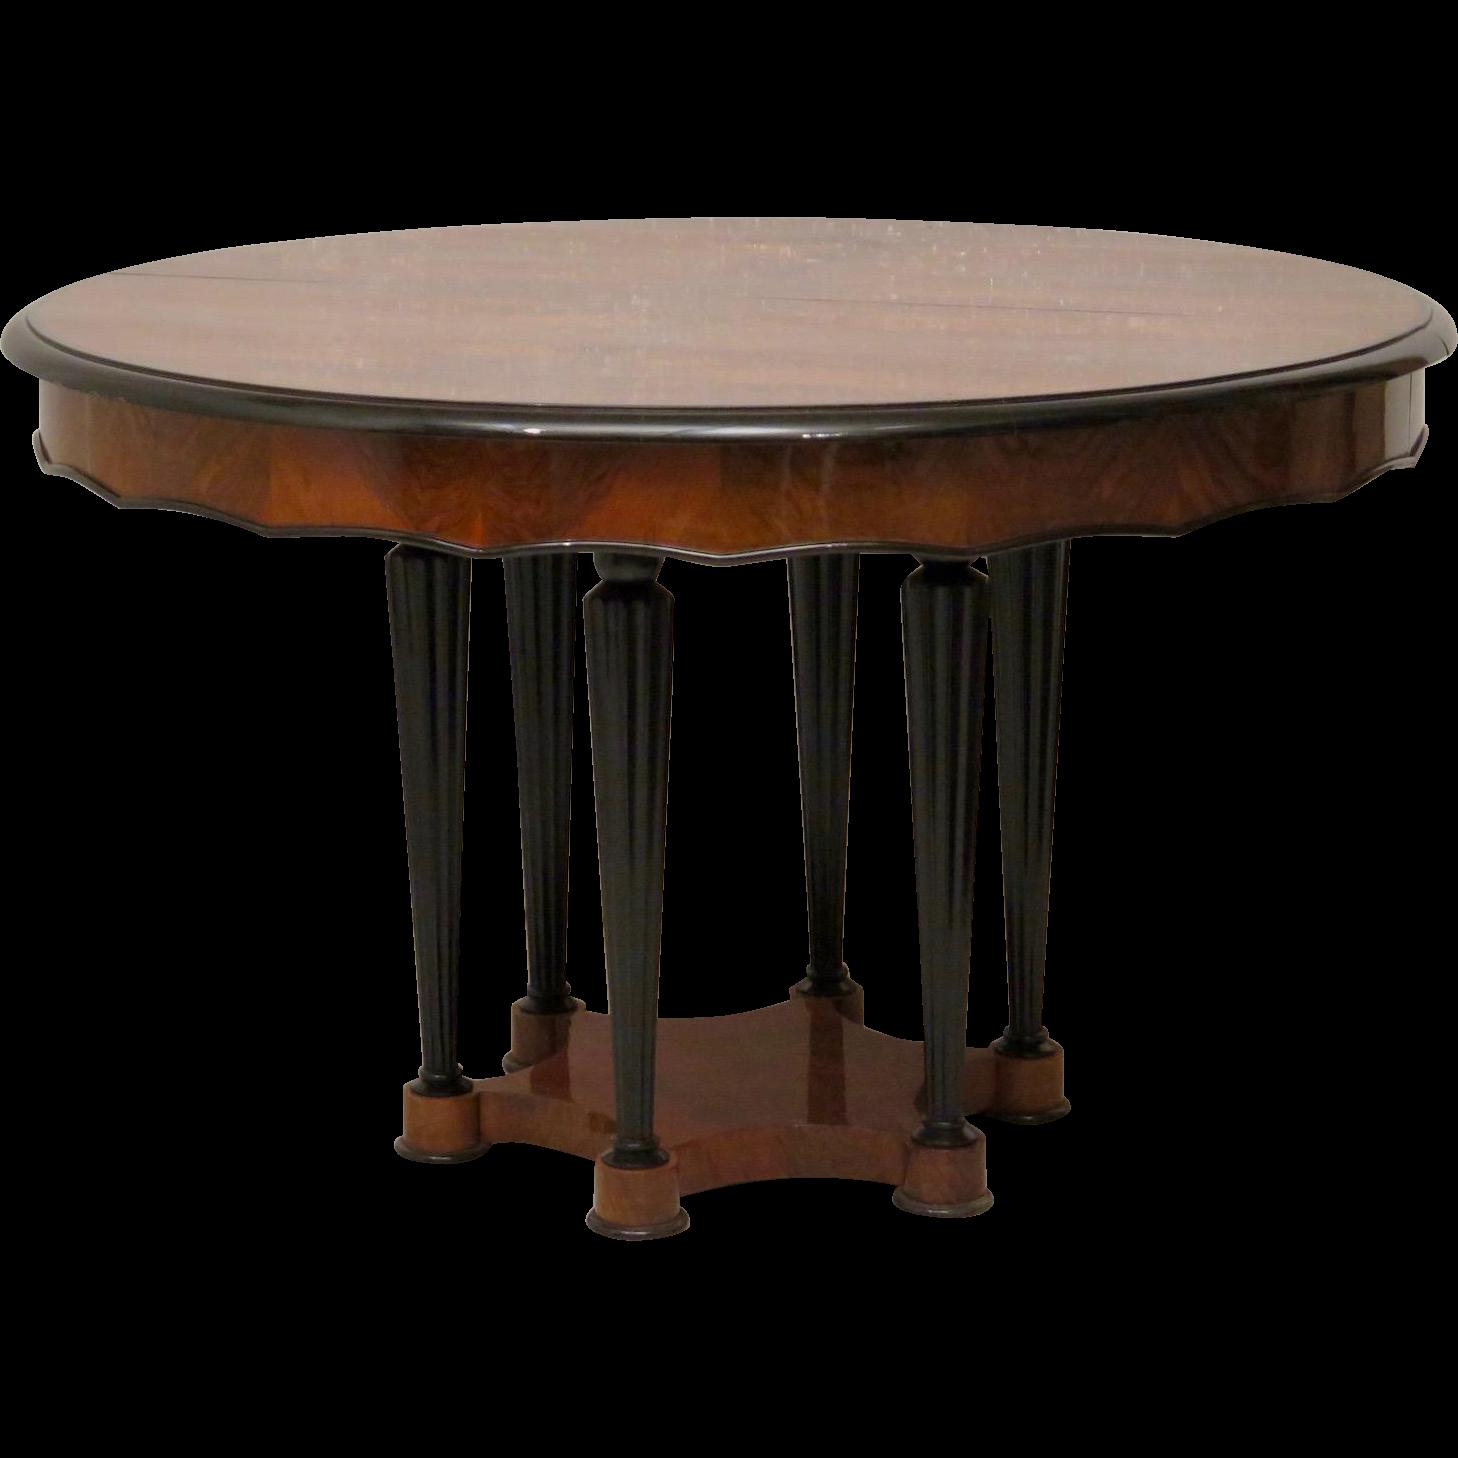 Rare Biedermeier Extendable Table